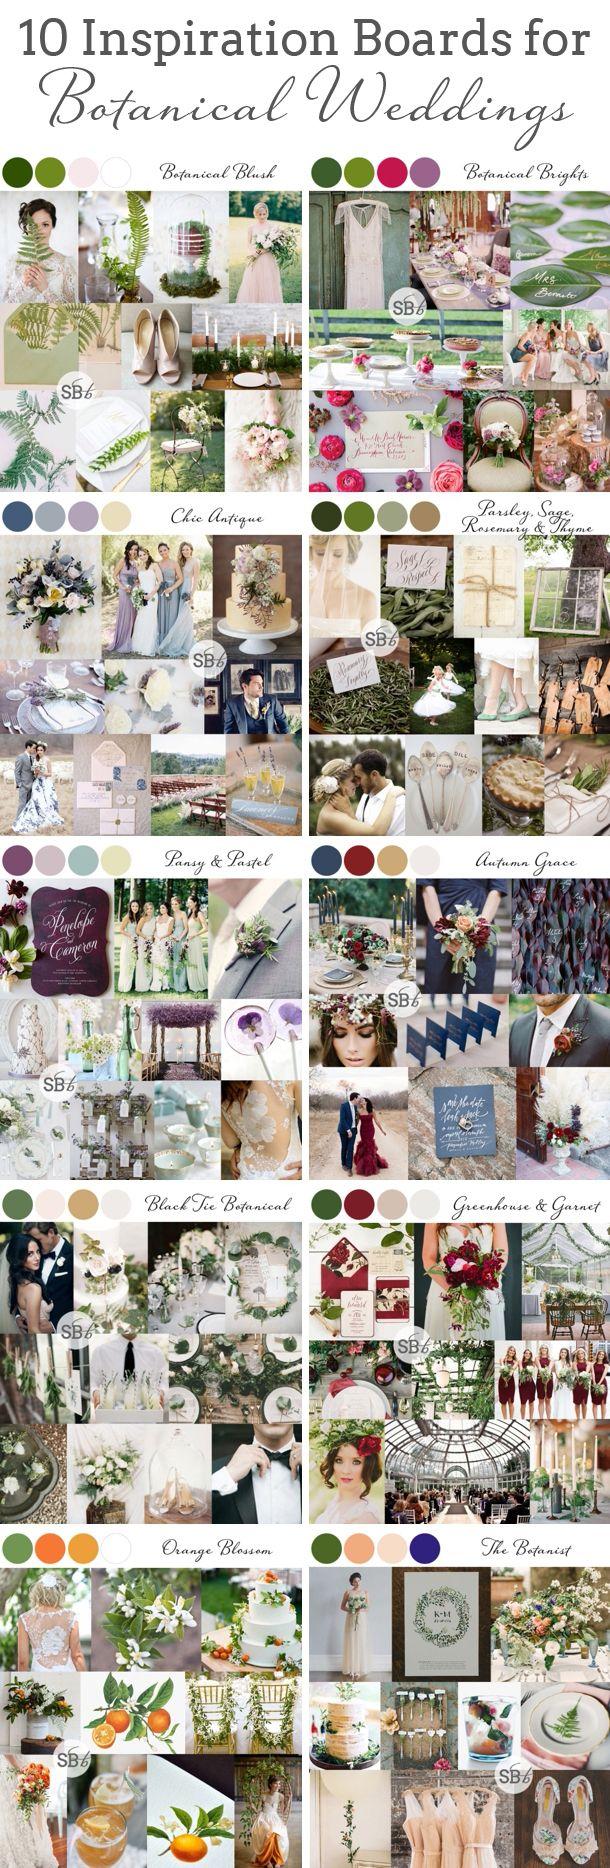 10 #Botanical #Wedding #InspirationBoards | SouthBound Bride www.southboundbride.com/10-botanical-wedding-inspiration-boards